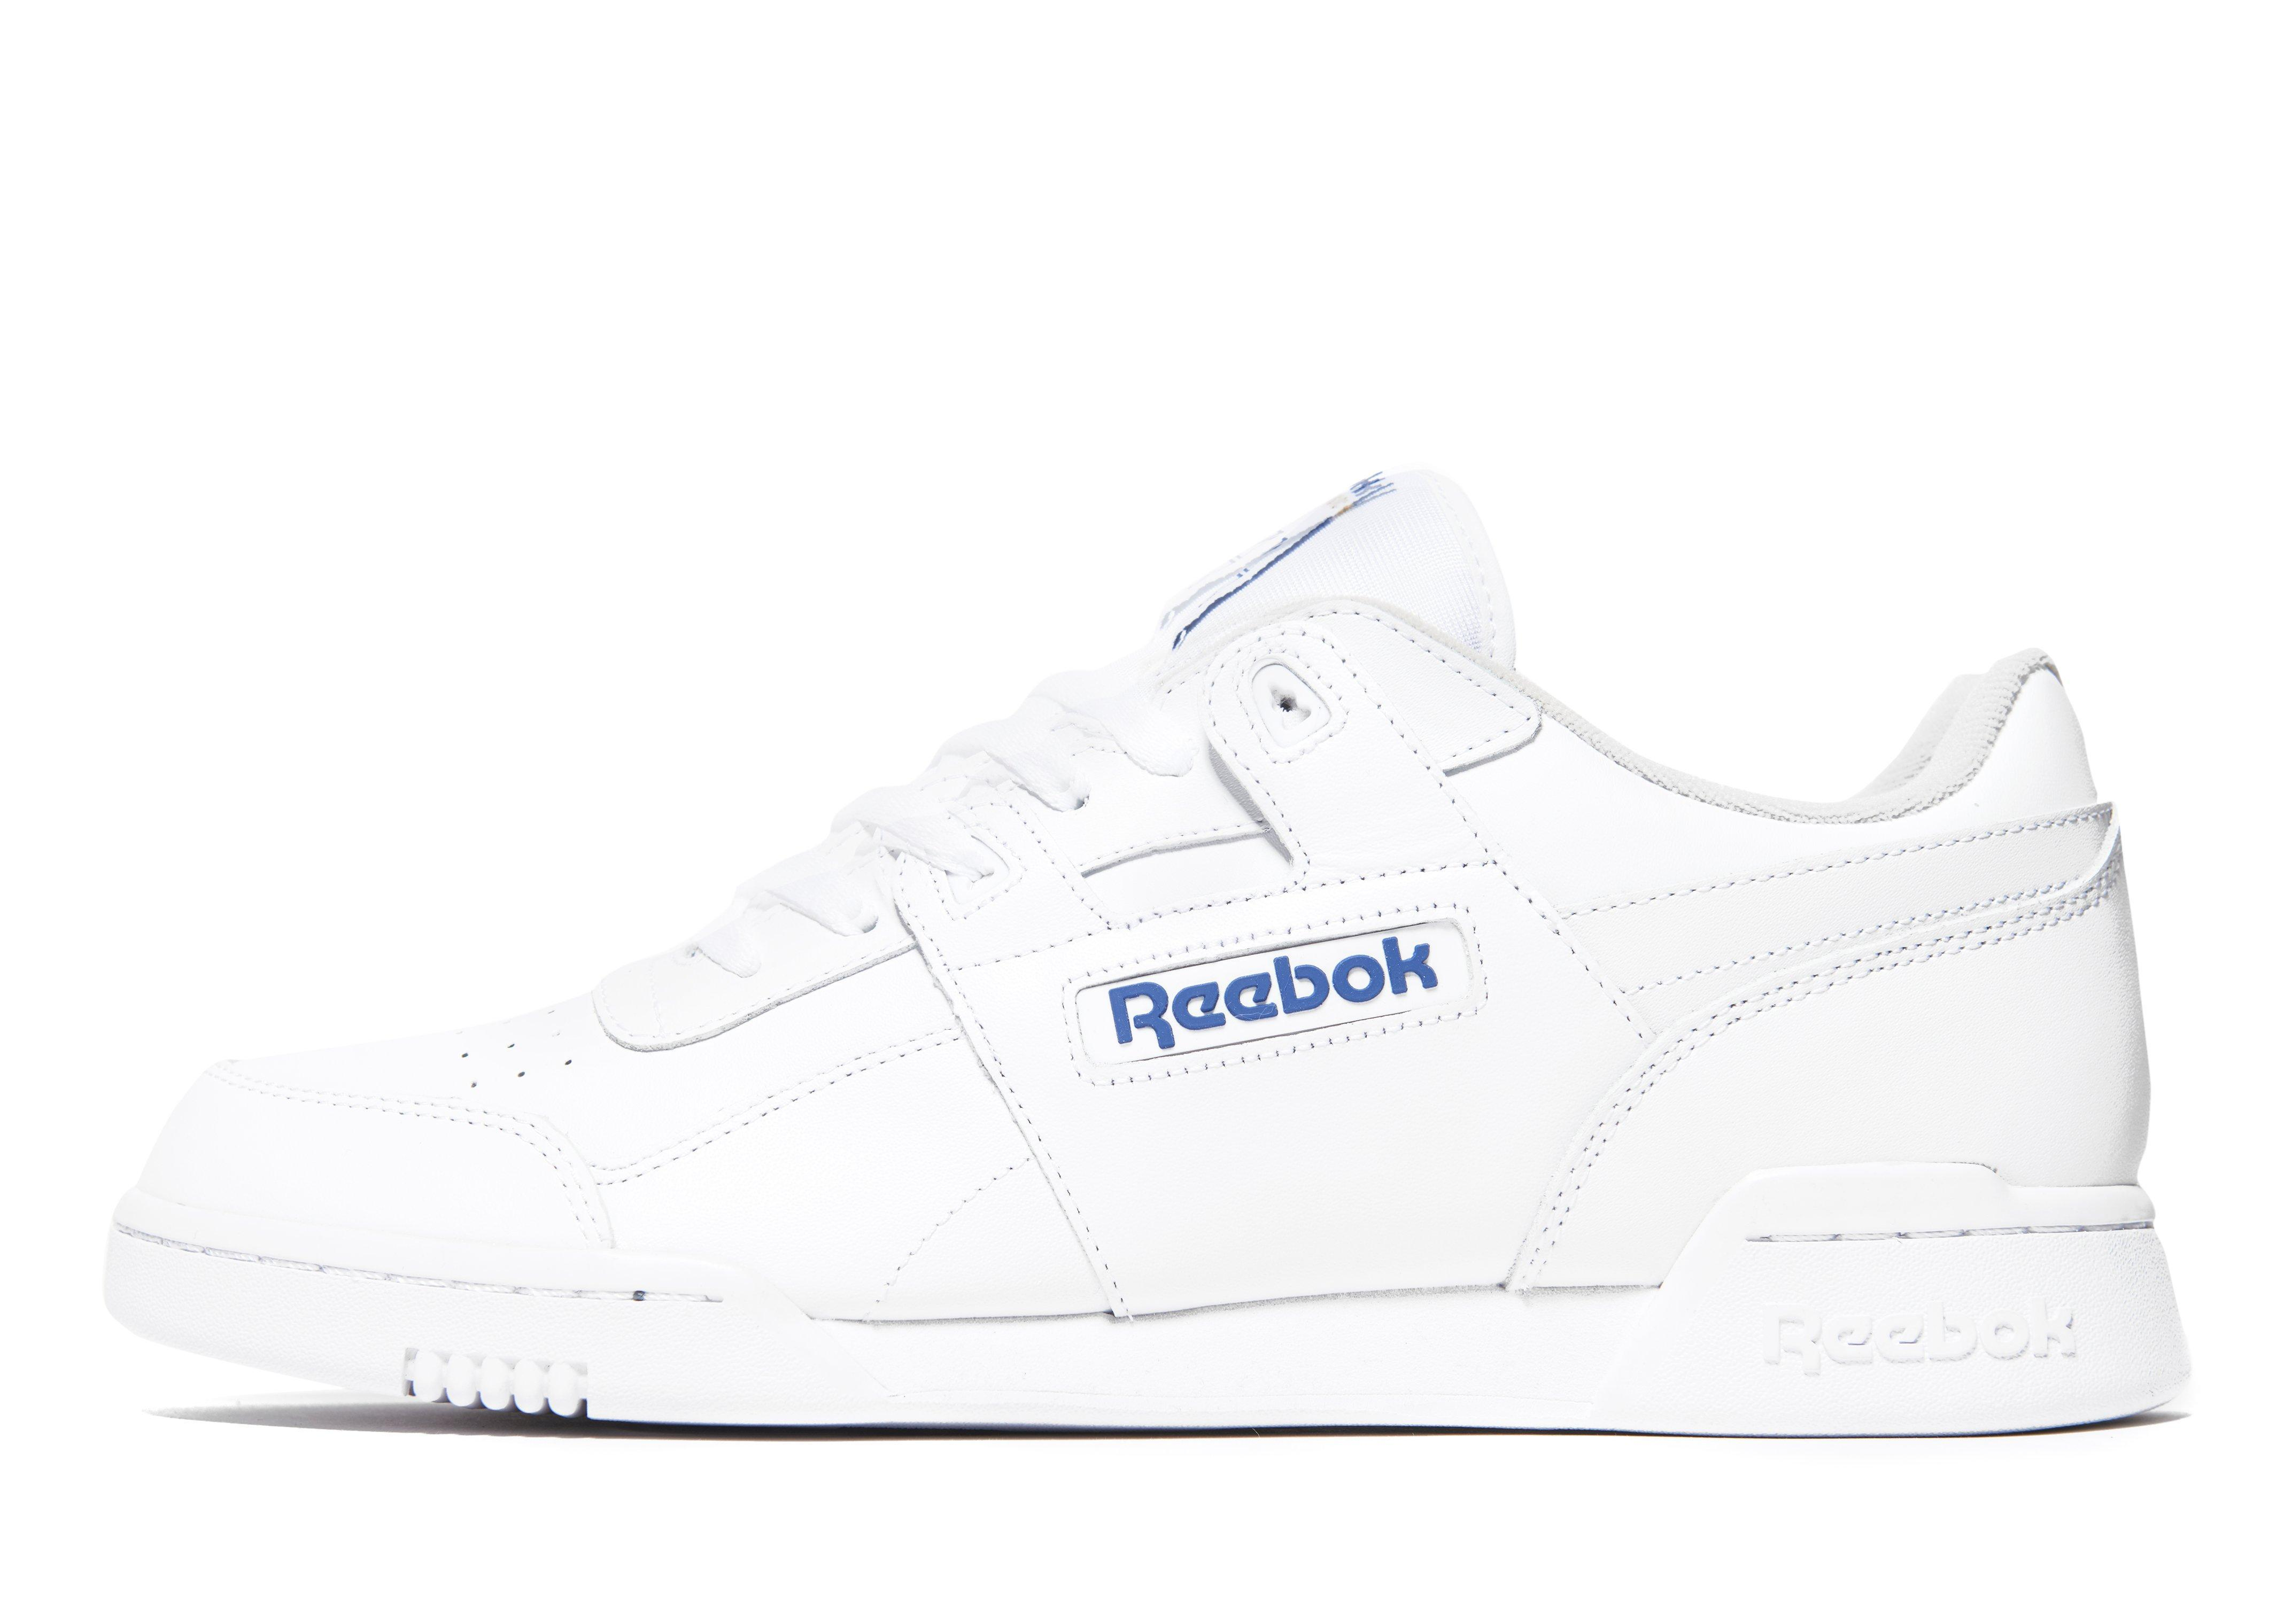 Lyst - Reebok Workout Plus in White for Men 0f1d5b5ff